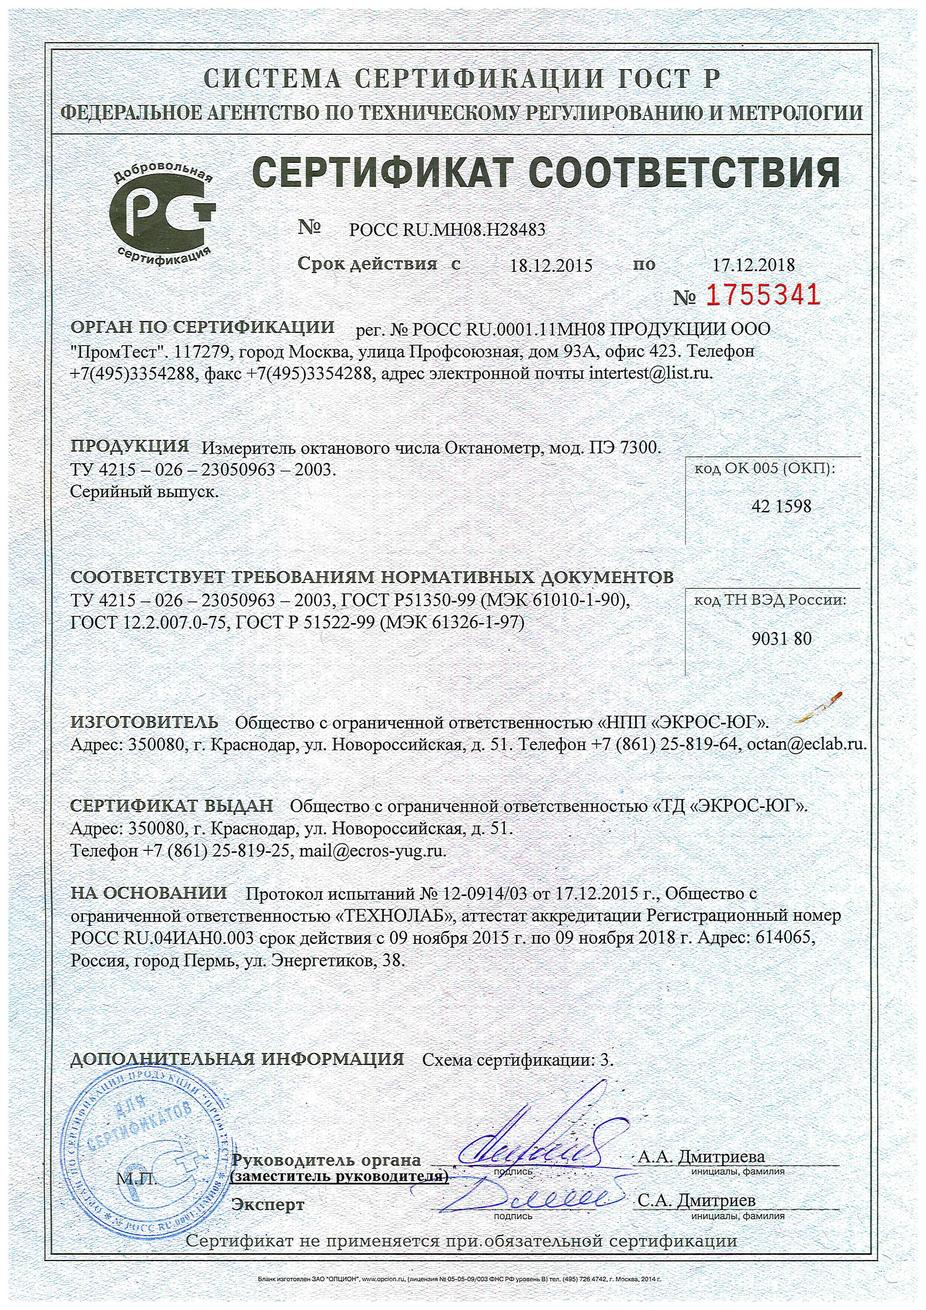 Сертификат соответствия на октанометр